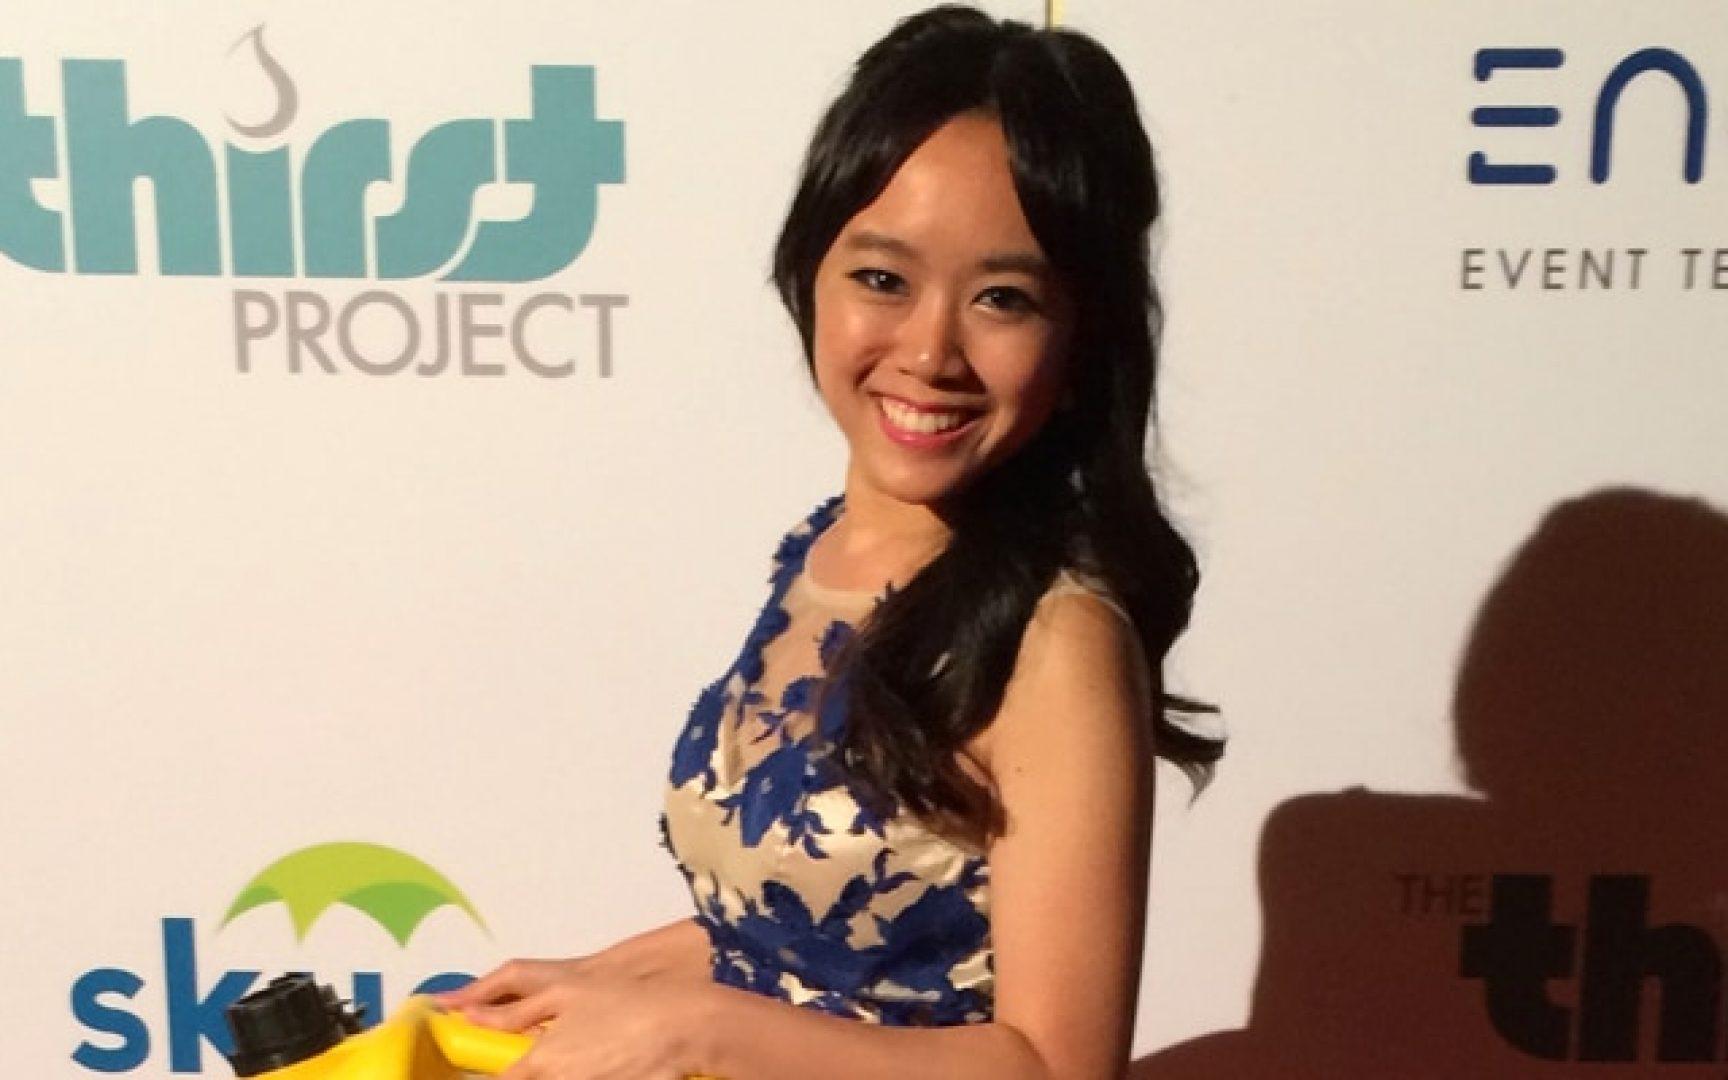 Sylvia Lai holding an award